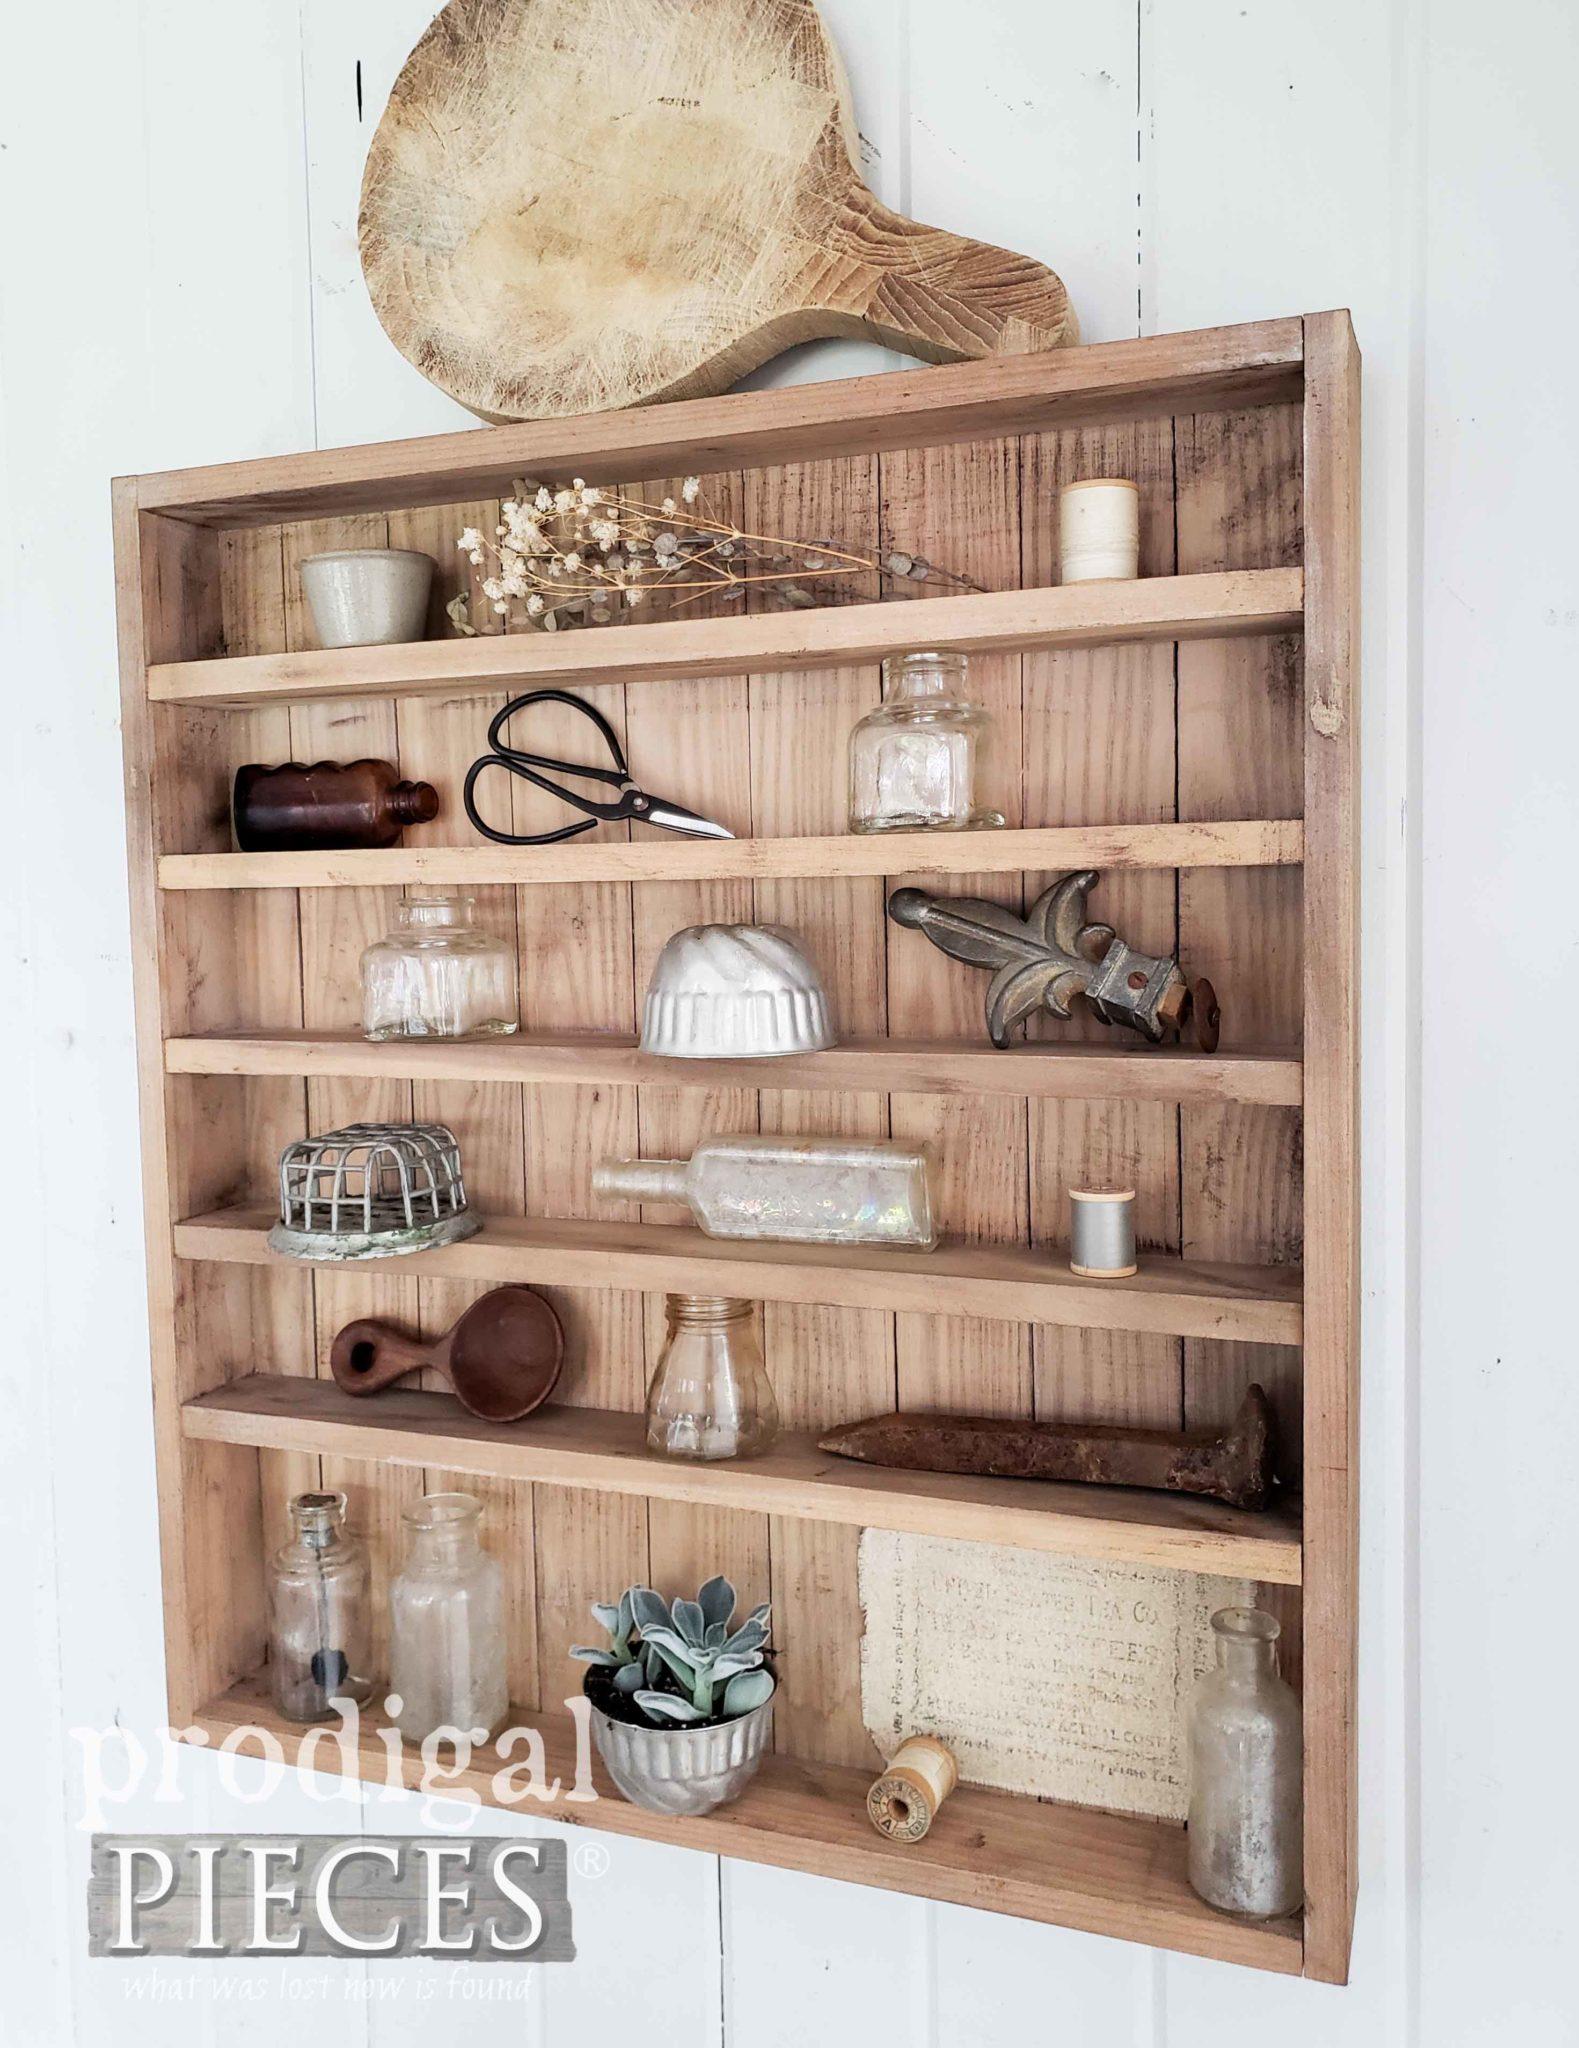 Simple Farmhouse Cabinet | DIY tutorial by Larissa of Prodigal Pieces | prodigalpieces.com #prodigalpieces #farmhouse #diy #home #homedecor